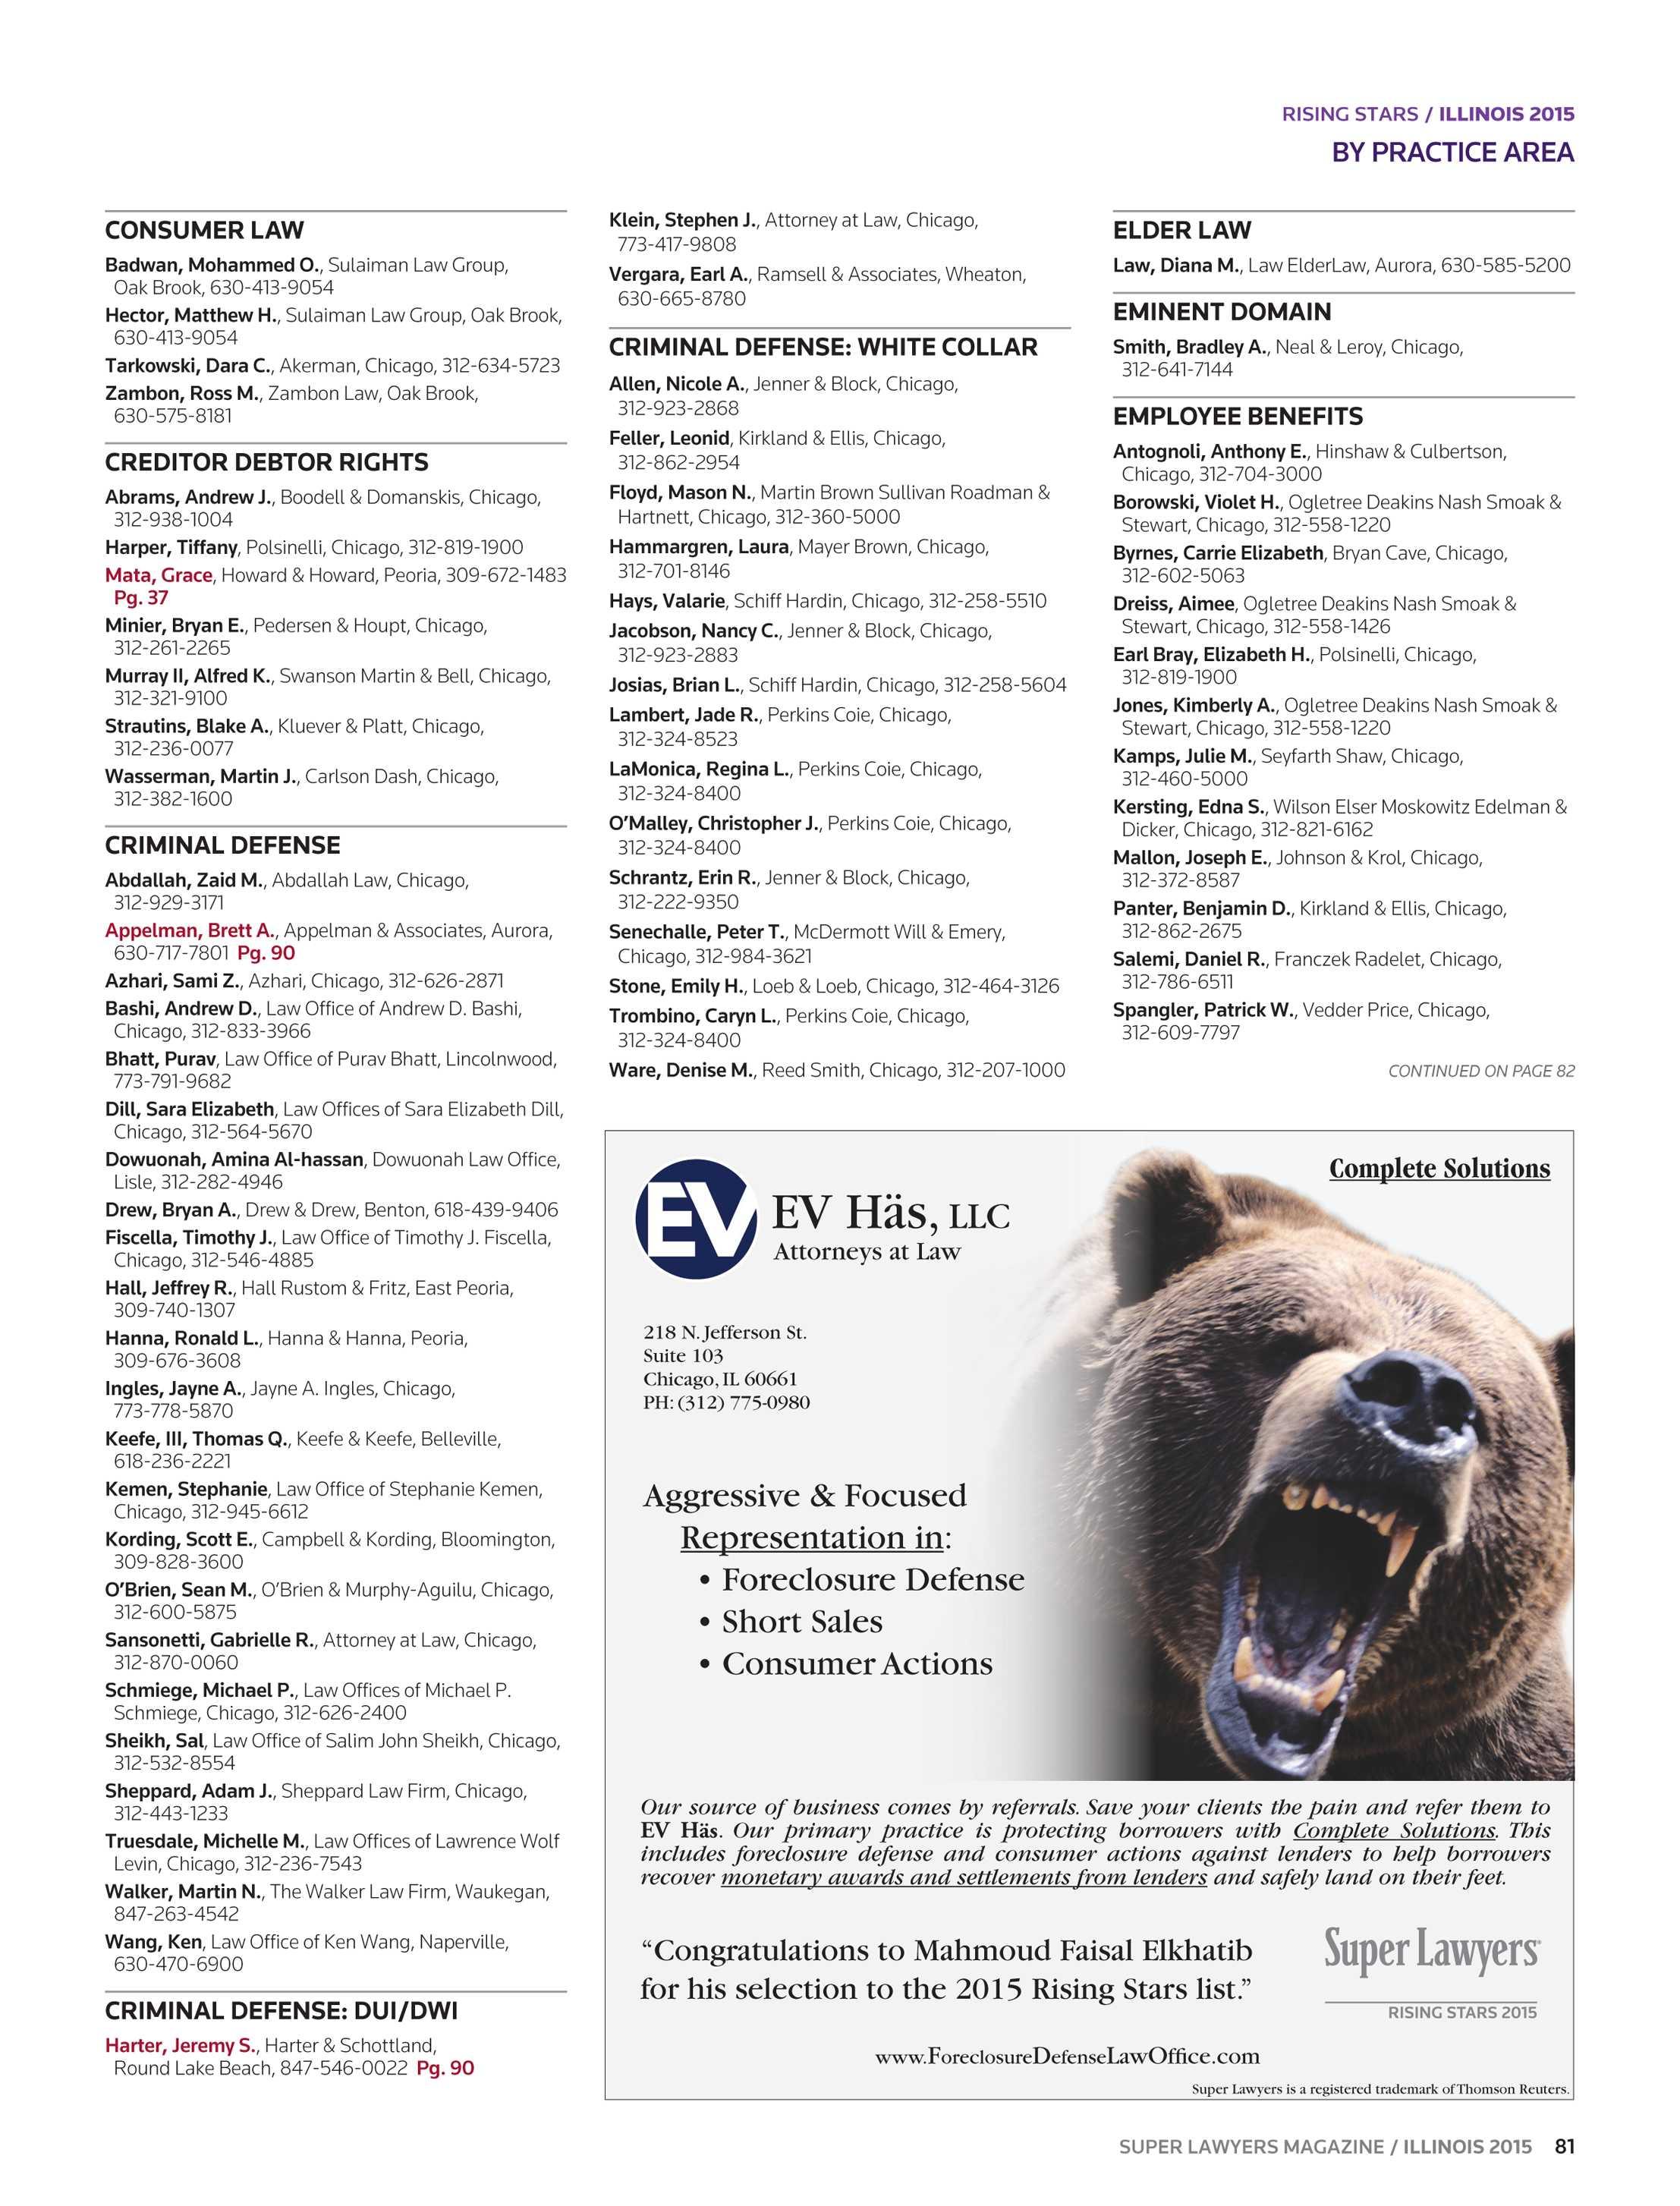 Super Lawyers - Illinois 2015 - page 81